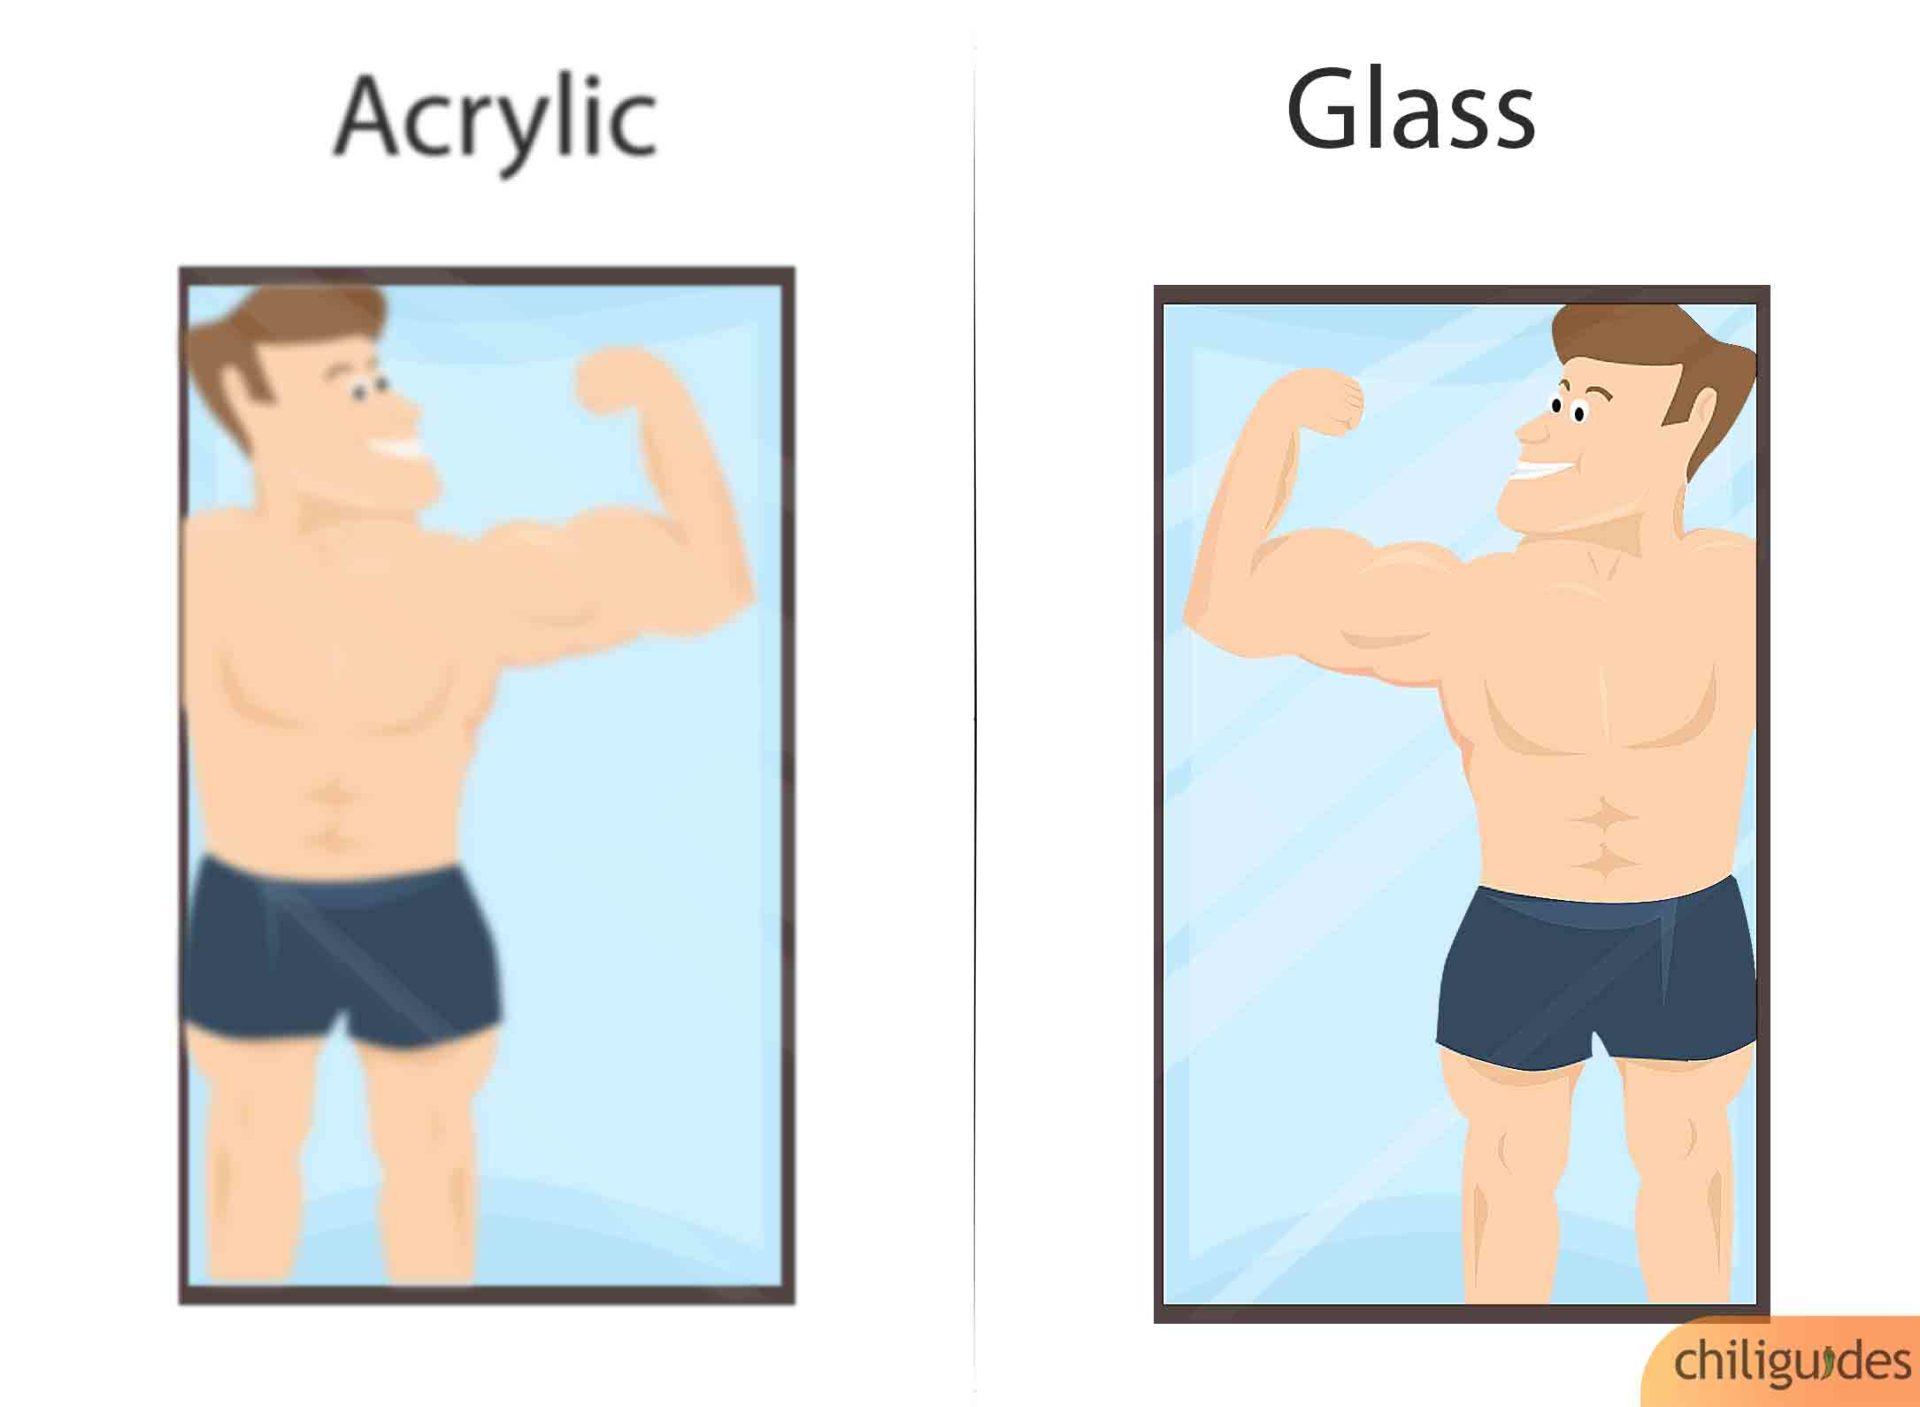 Glass vs. Acrylic